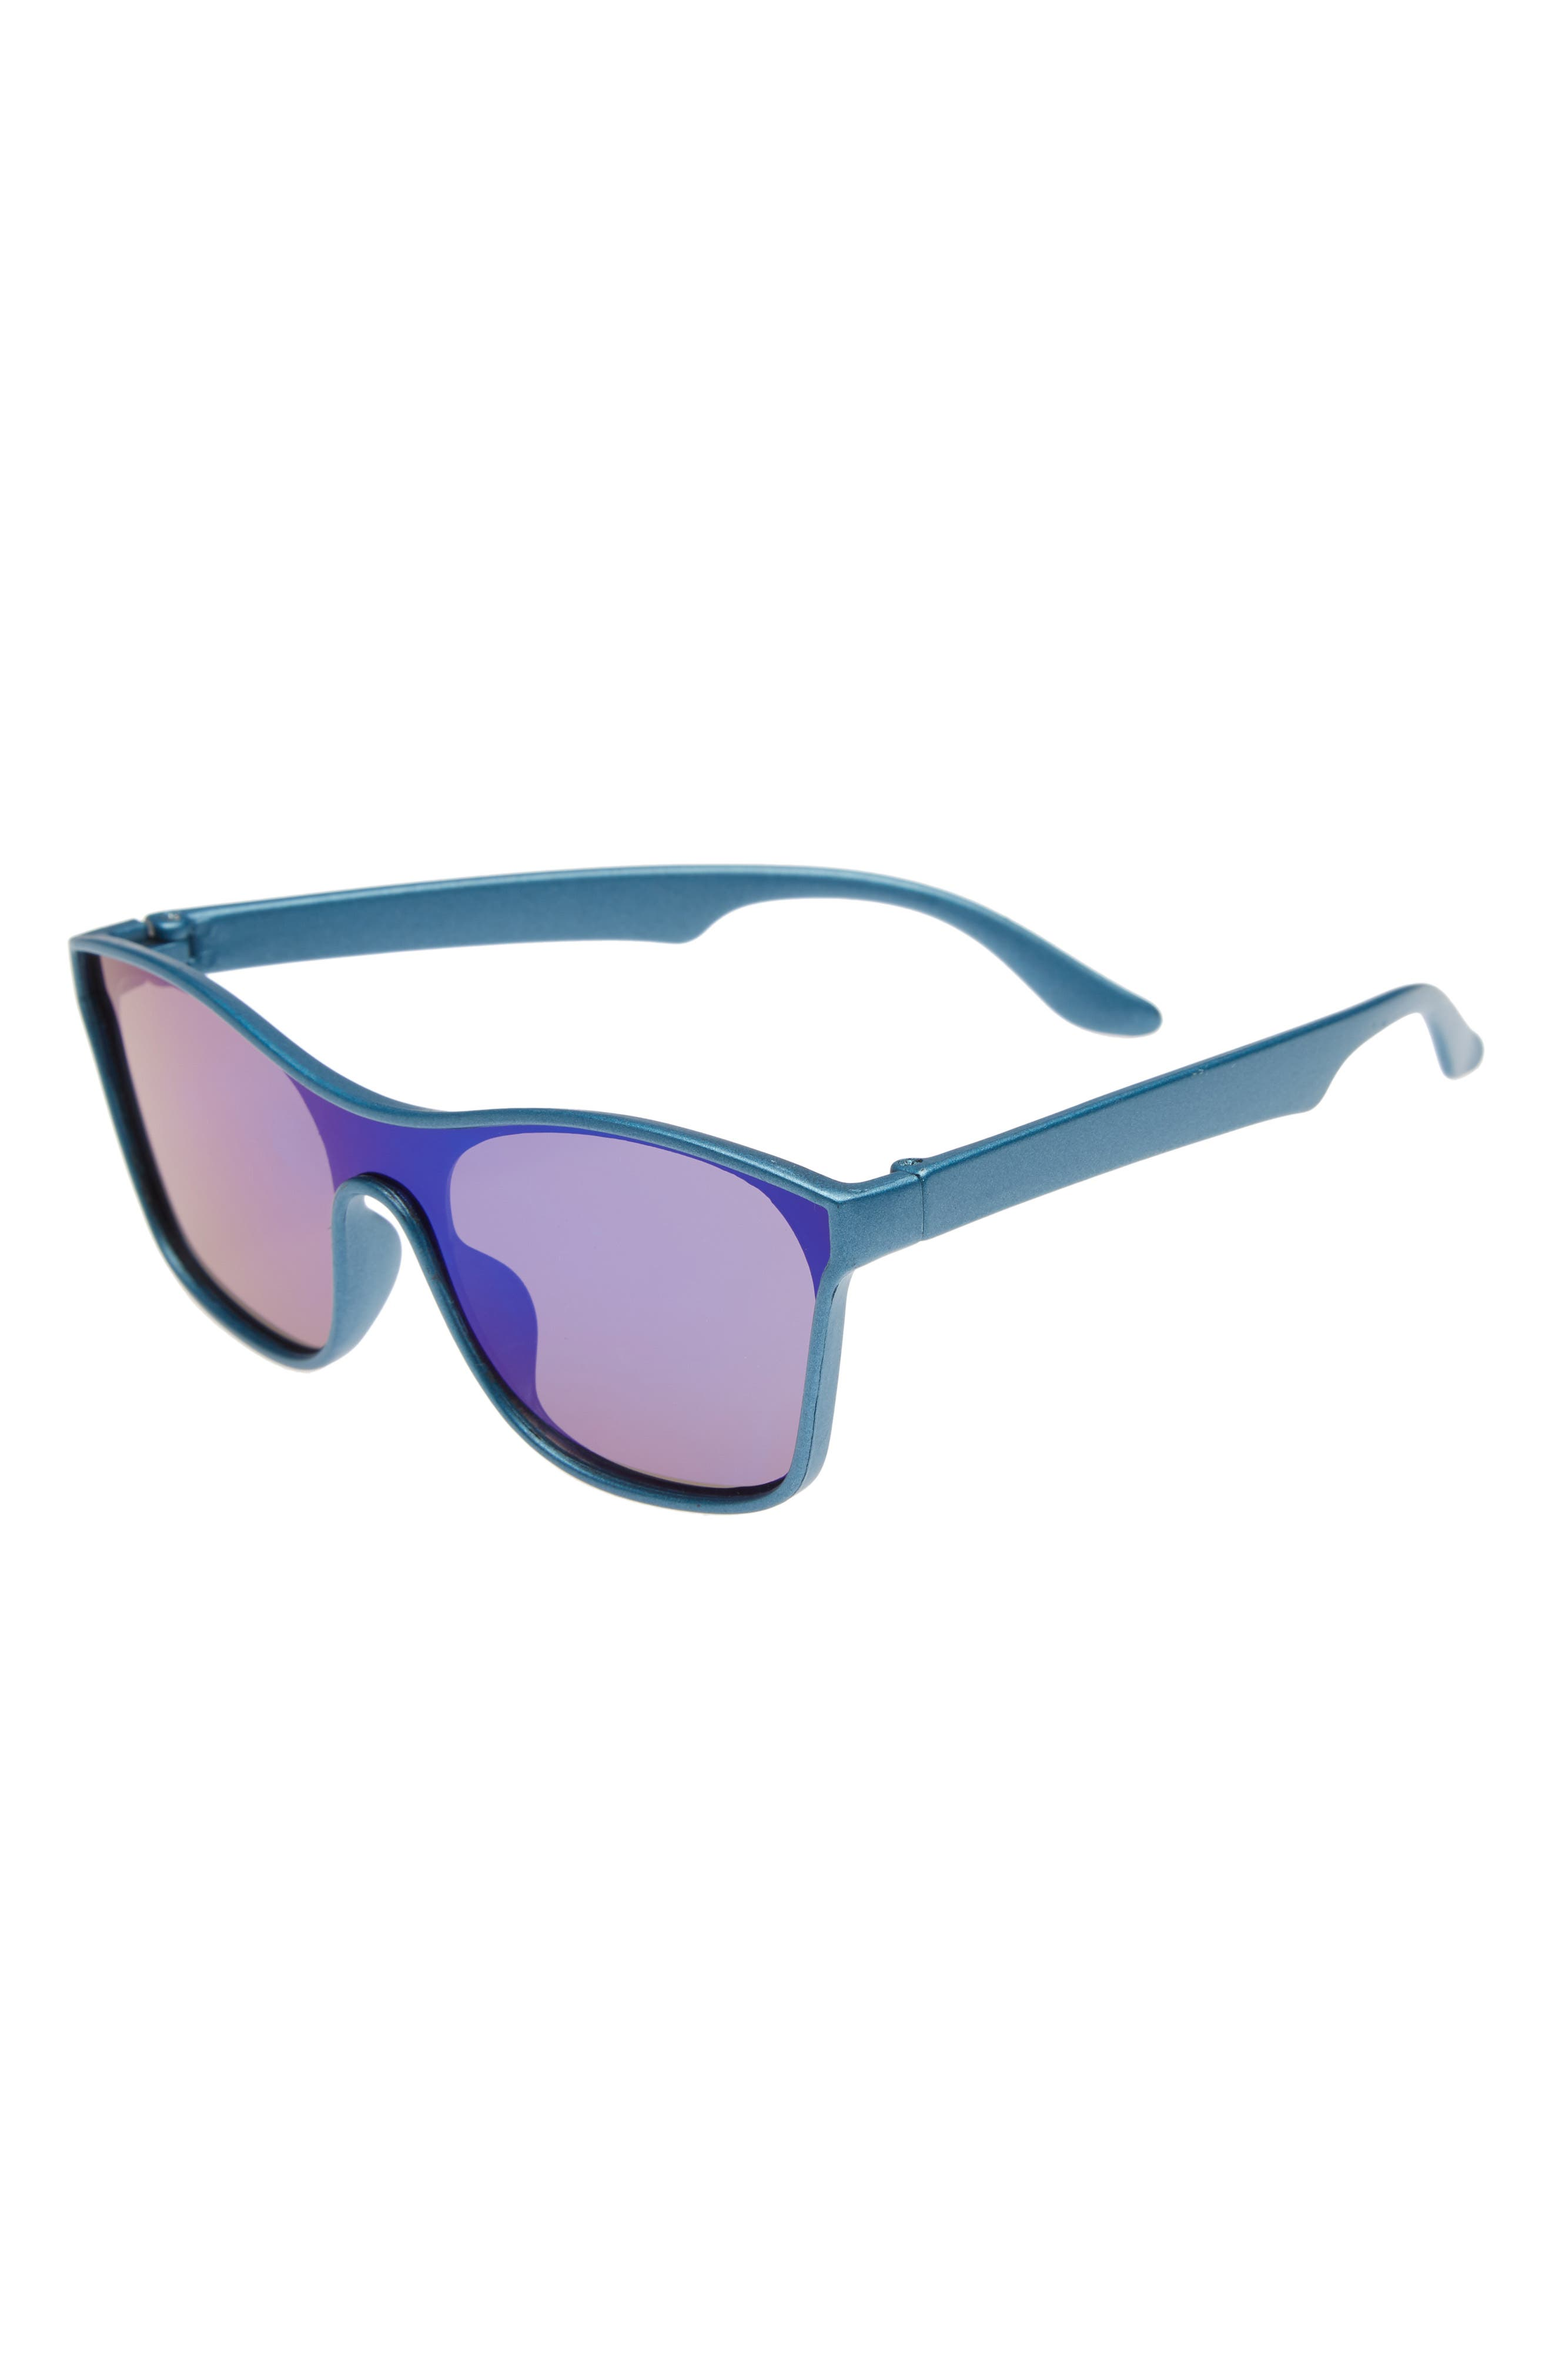 Alternate Image 1 Selected - Fantas Eyes Mirrored Sunglasses (Boys)